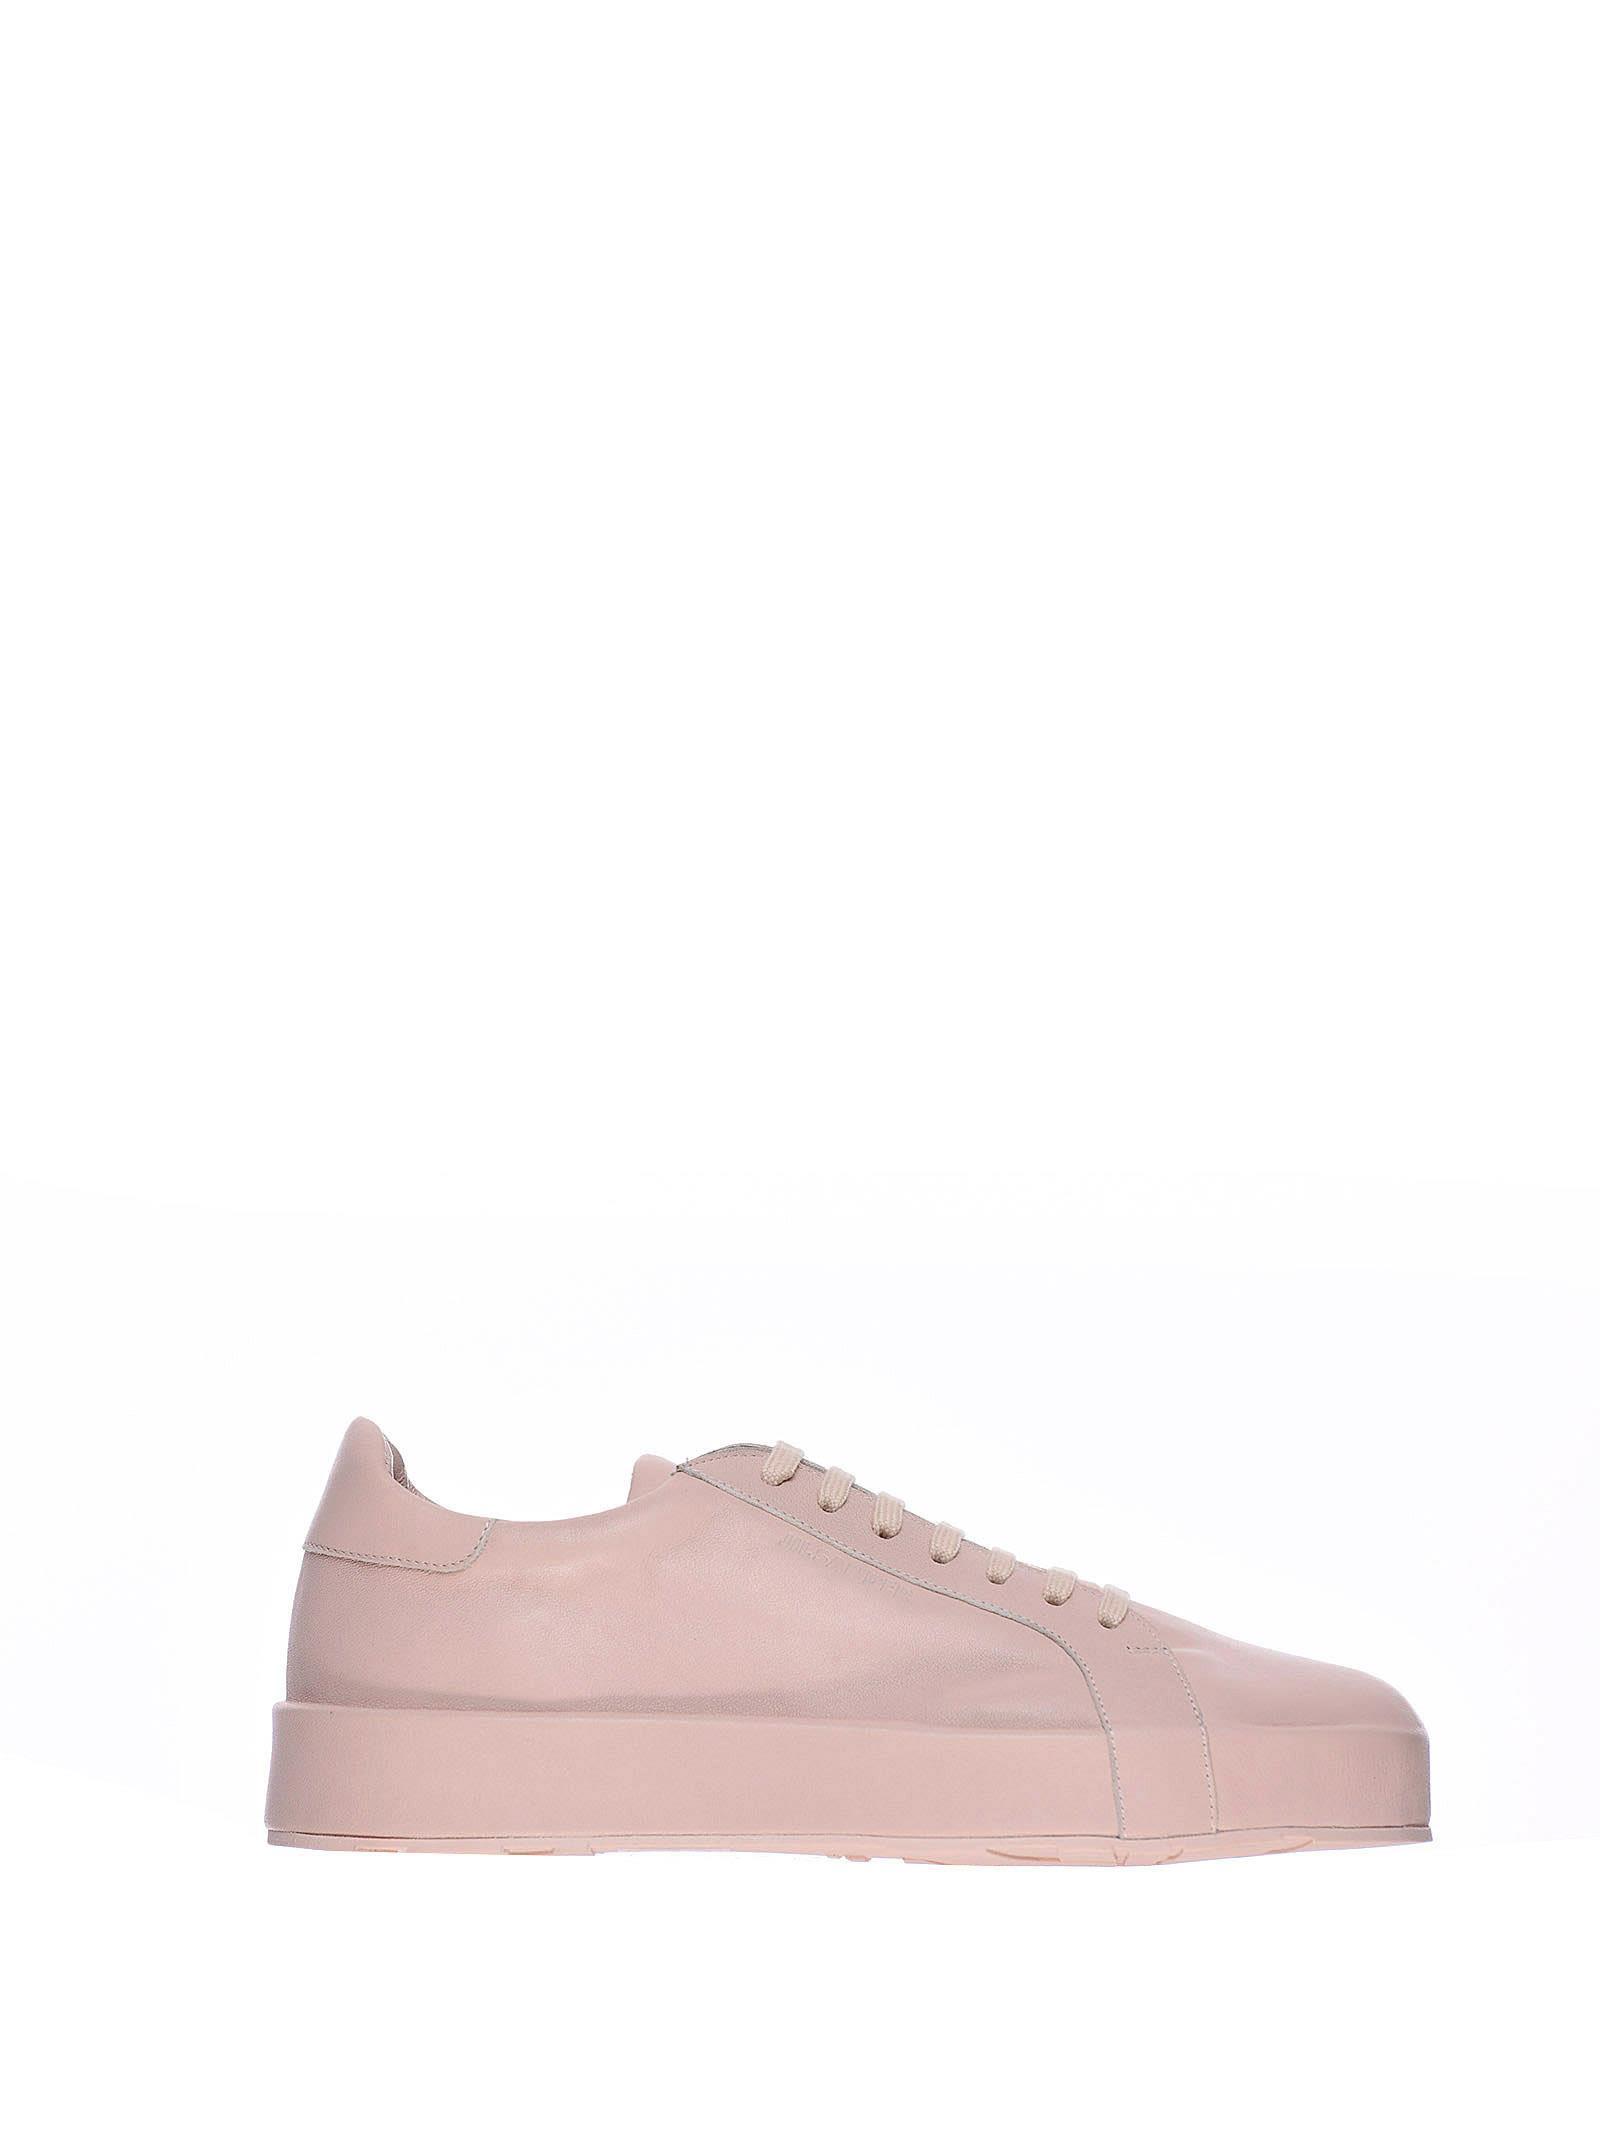 Jil Sander Sneaker Pink